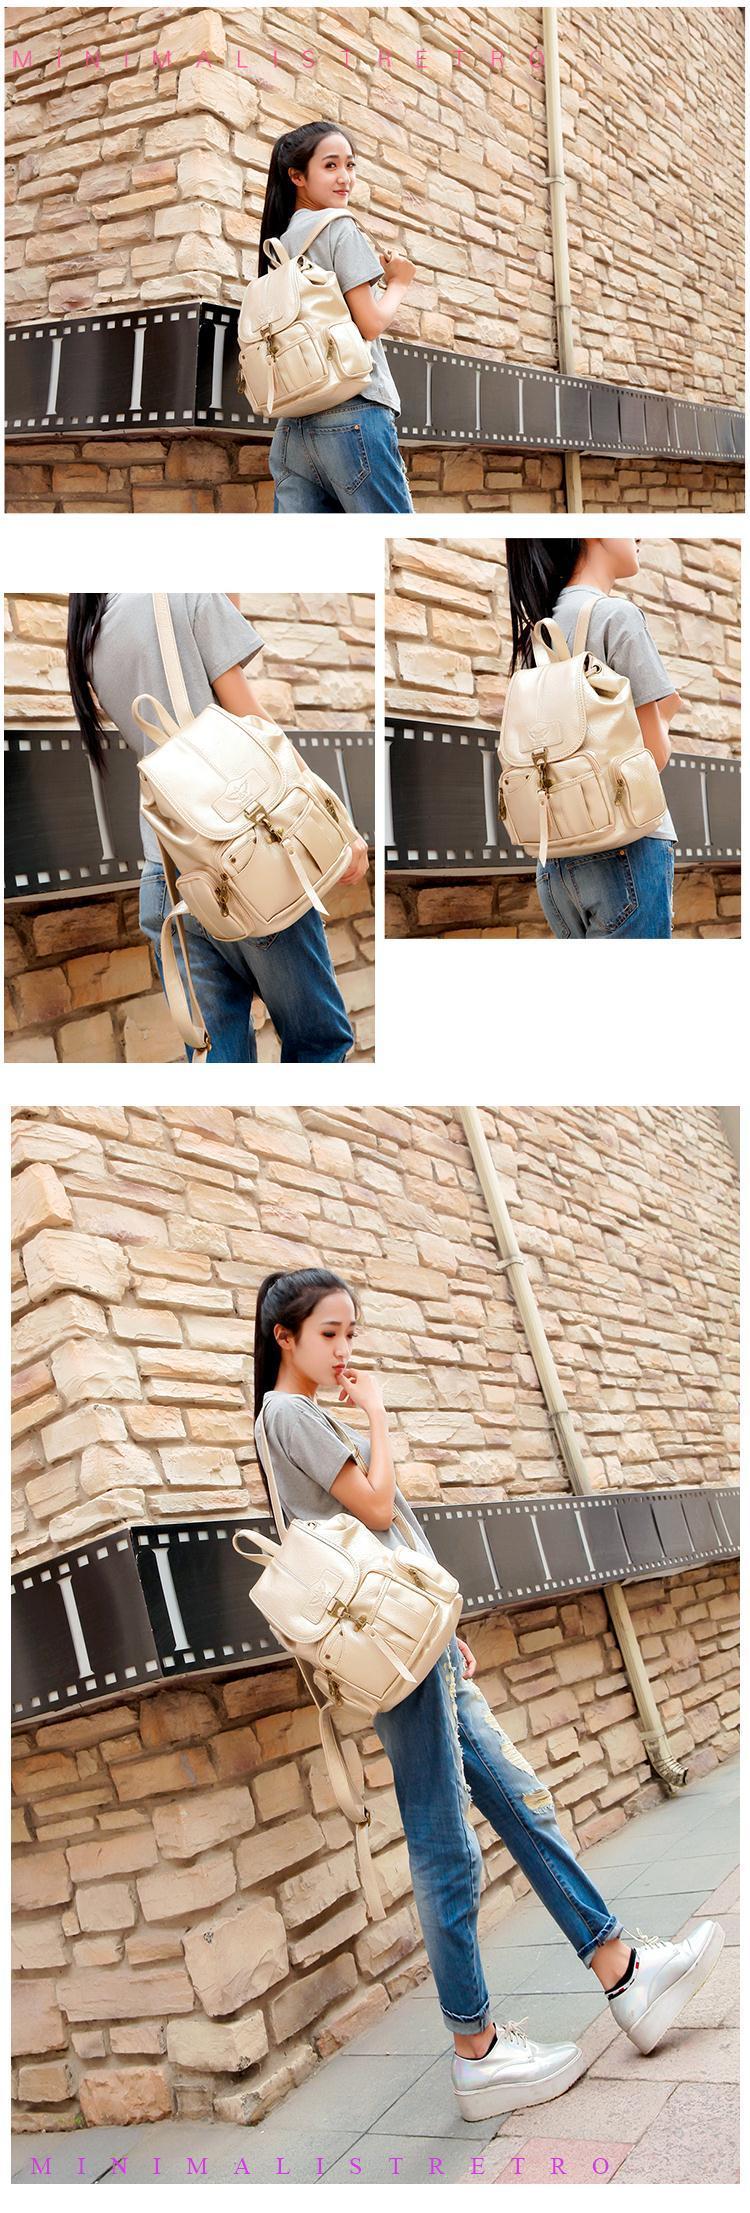 HTB1FVcJyuuSBuNjSsziq6zq8pXan High Quality Women Backpack Vintage Backpacks For Teenage Girls Fashion Large School Bags PU Leather Black Mochila Feminina